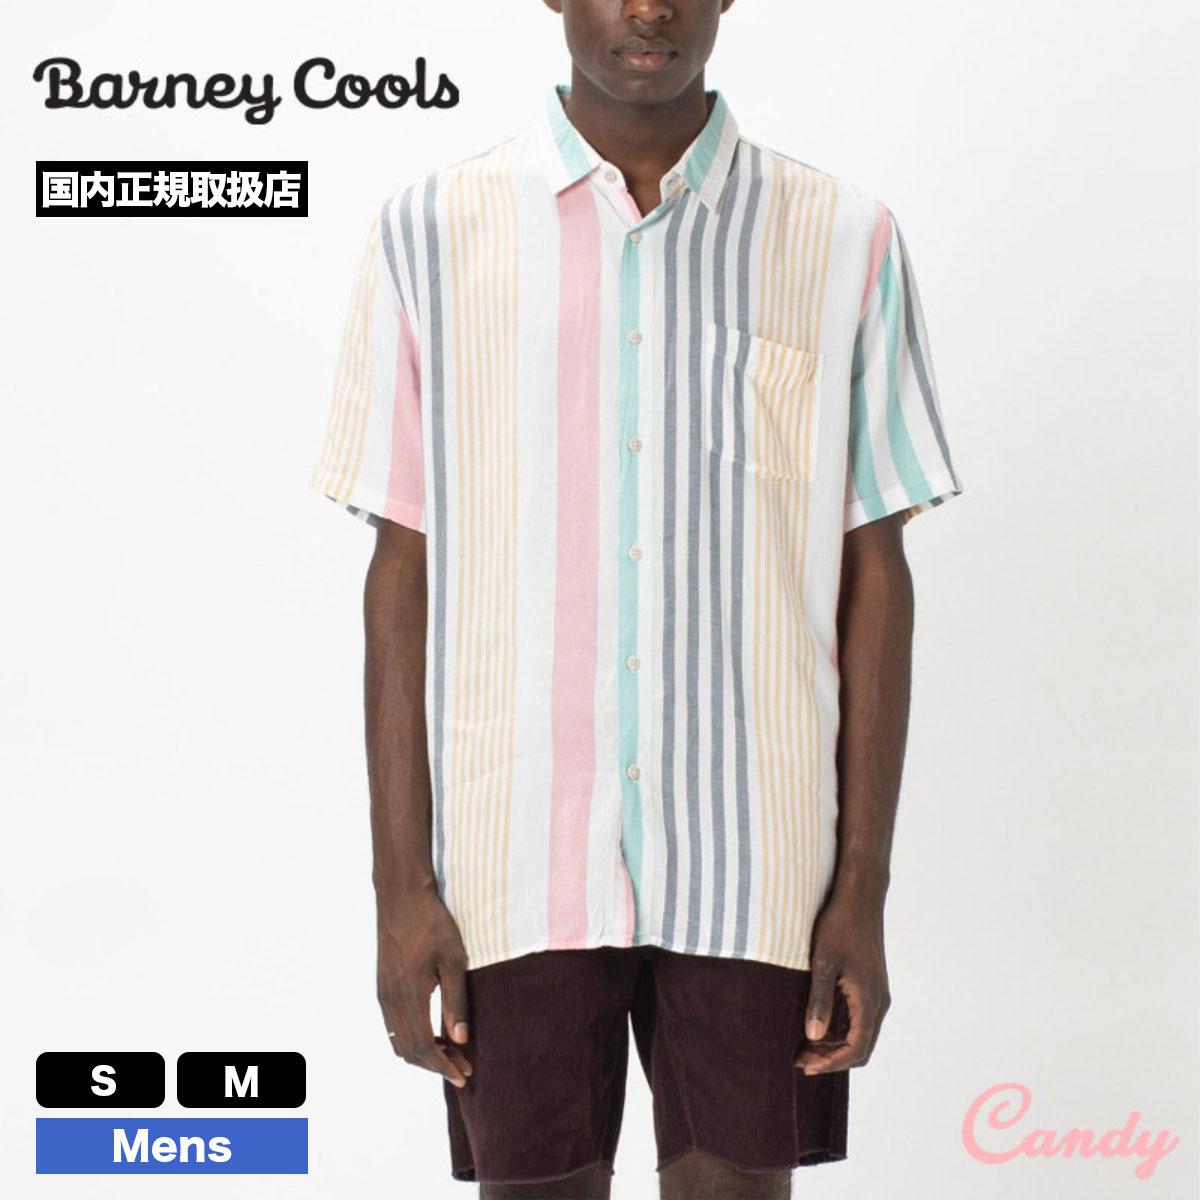 Barney Cools国内正規取り扱い店、ジャックオーシャンスポーツ